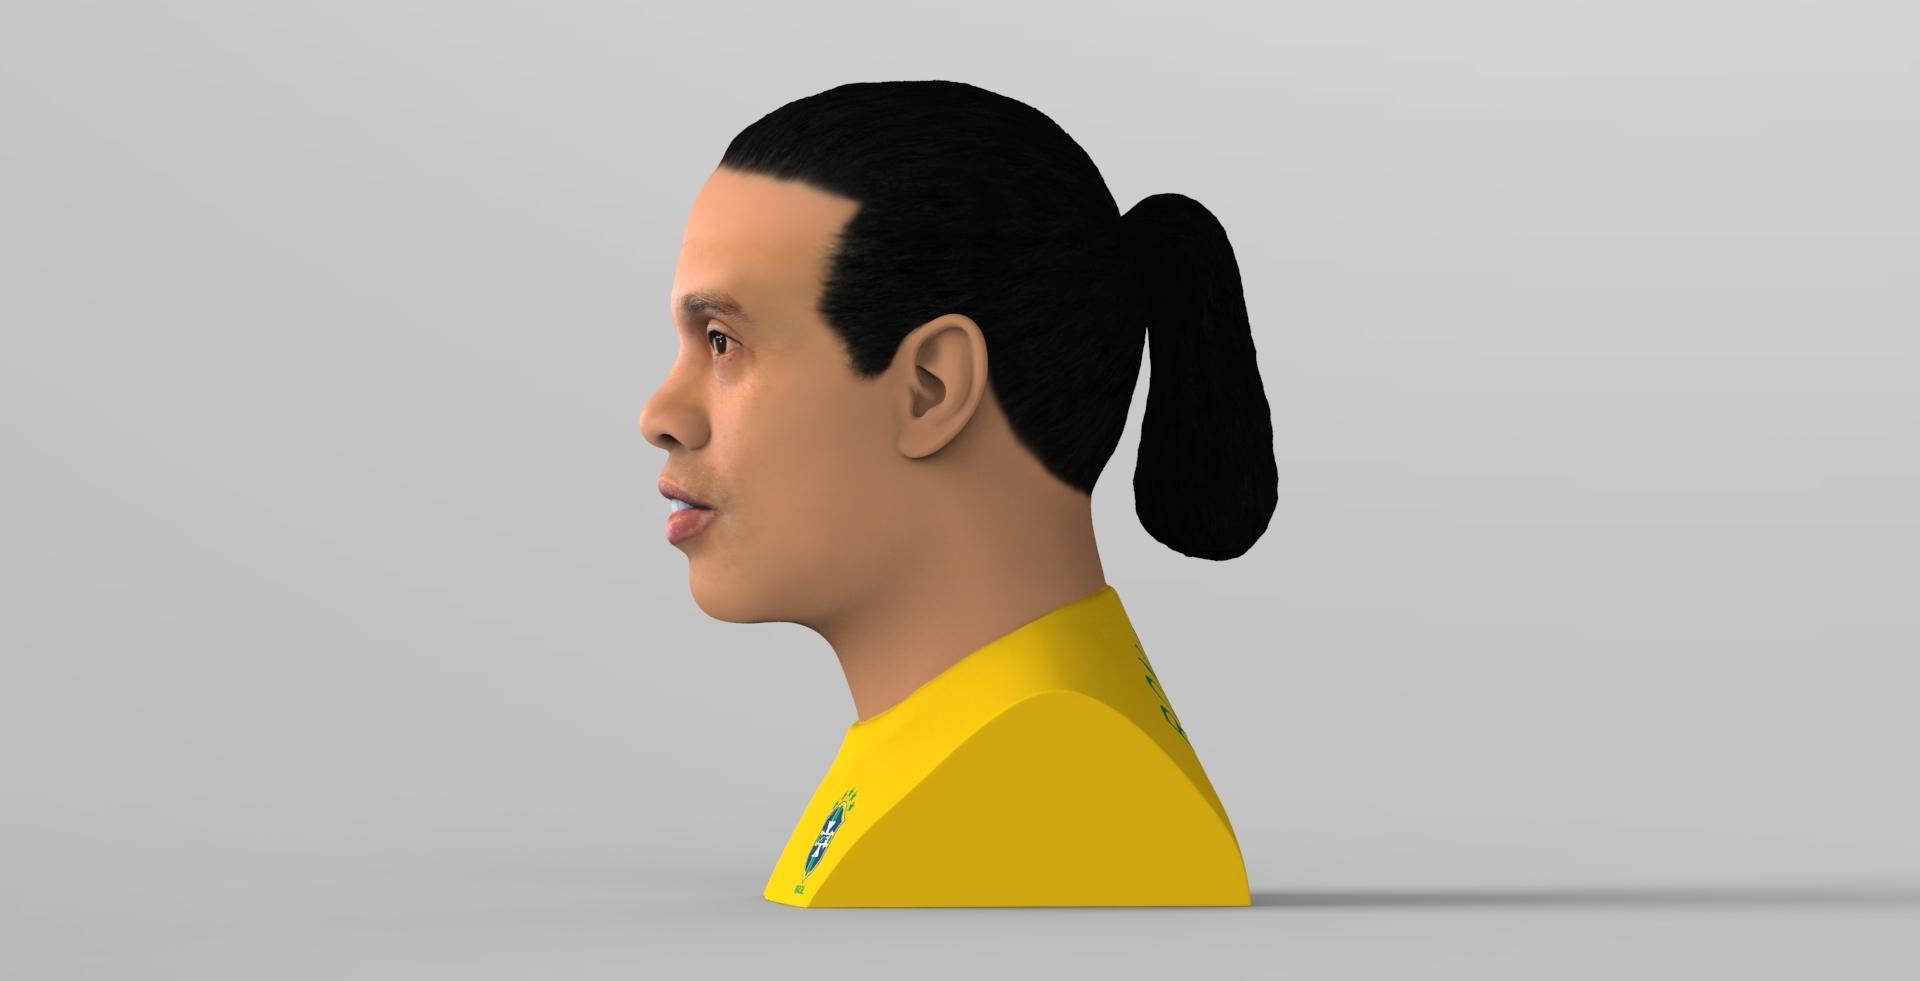 untitled.1682.jpg Download STL file Ronaldinho bust ready for full color 3D printing • 3D print model, PrintedReality